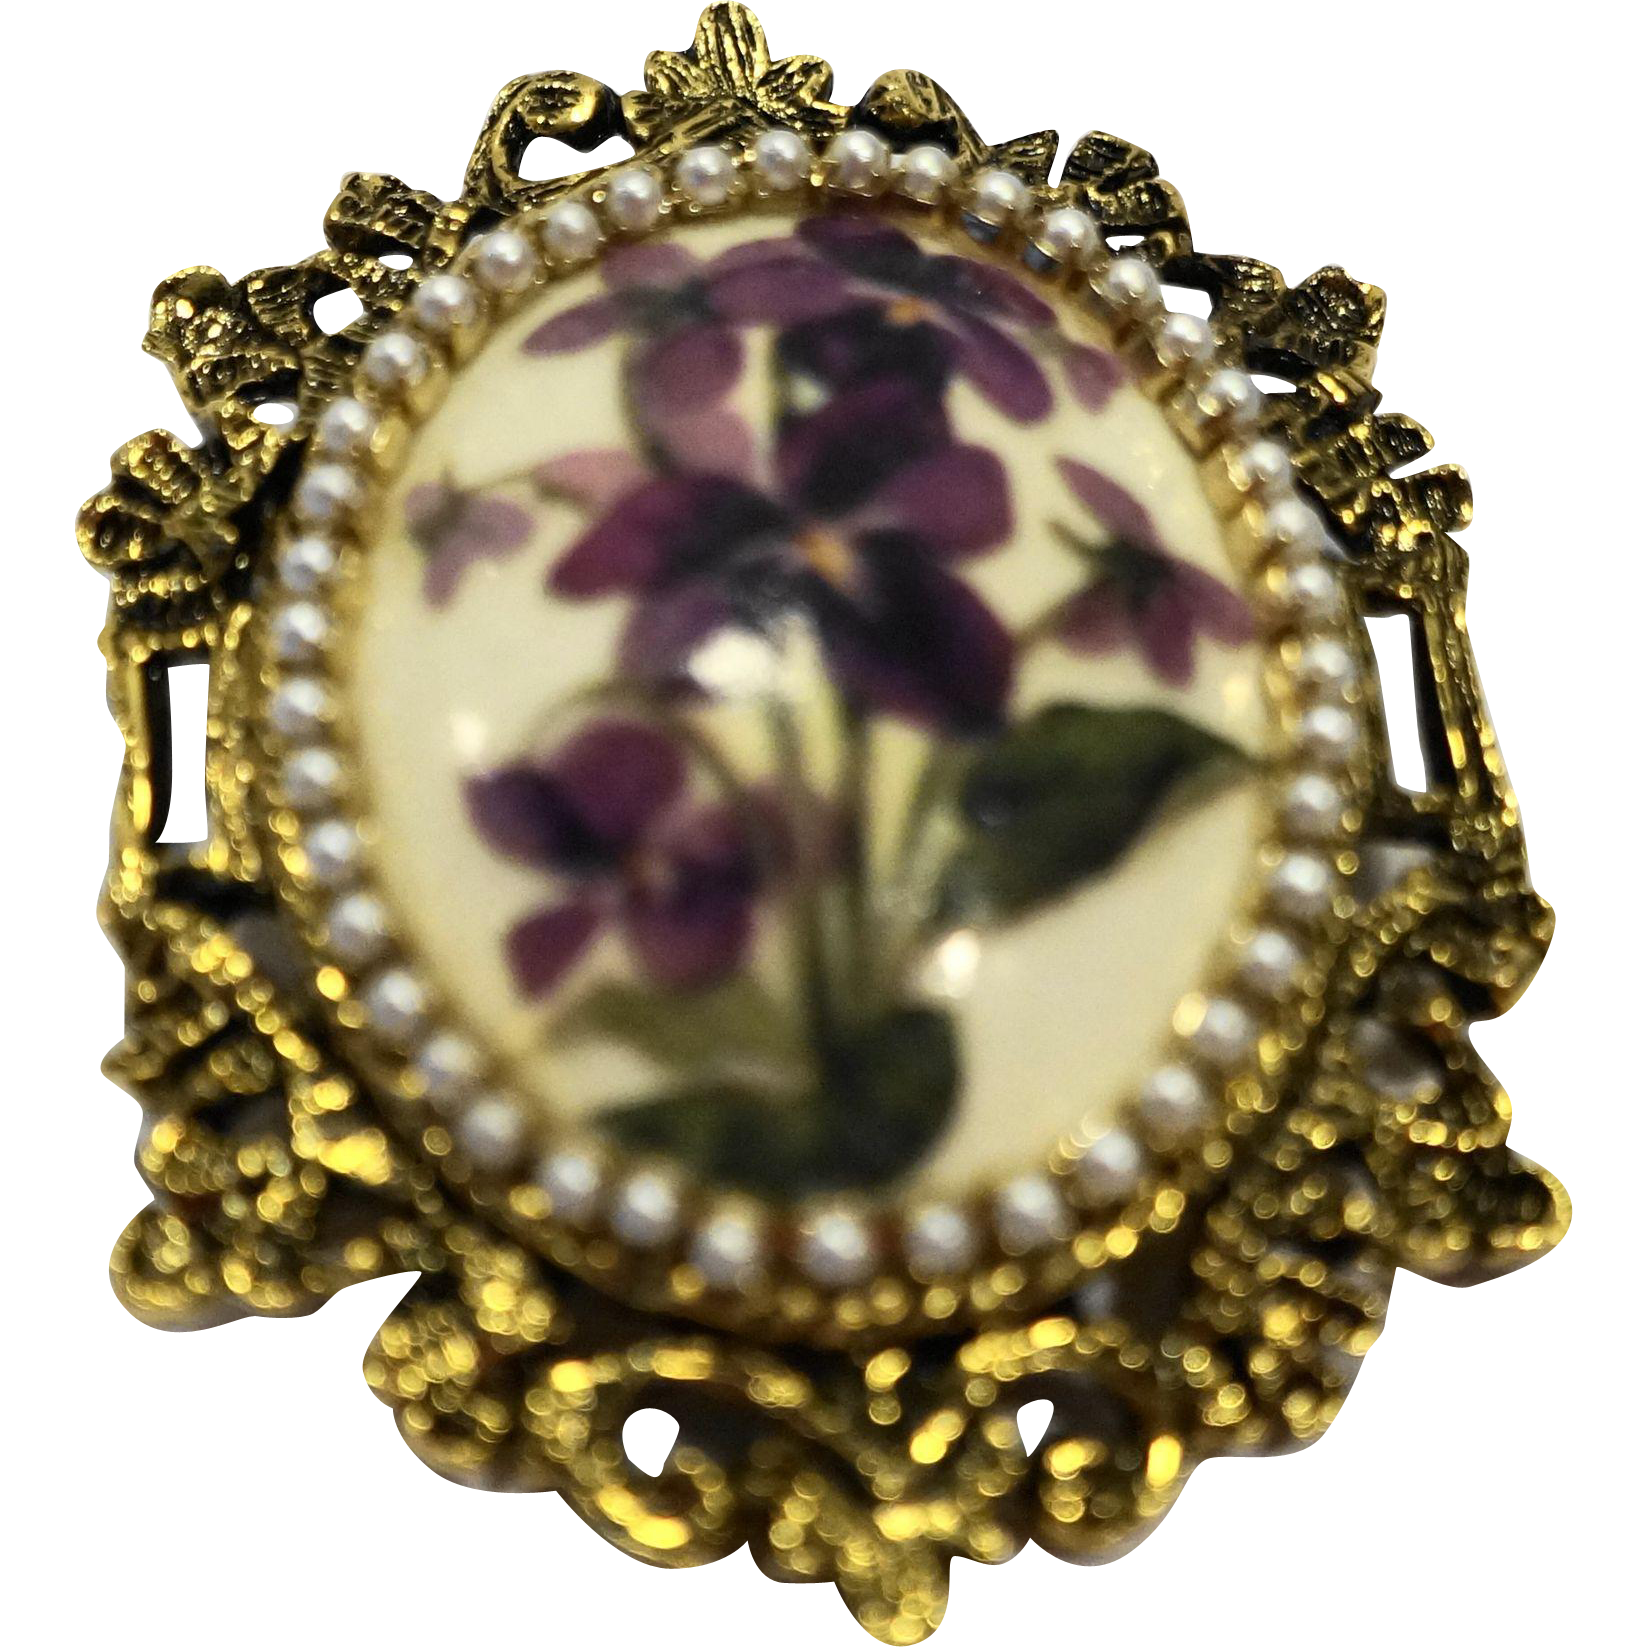 Violets Flower Porcelain Oval Pin Pendant Ornate Gold Tone Finding